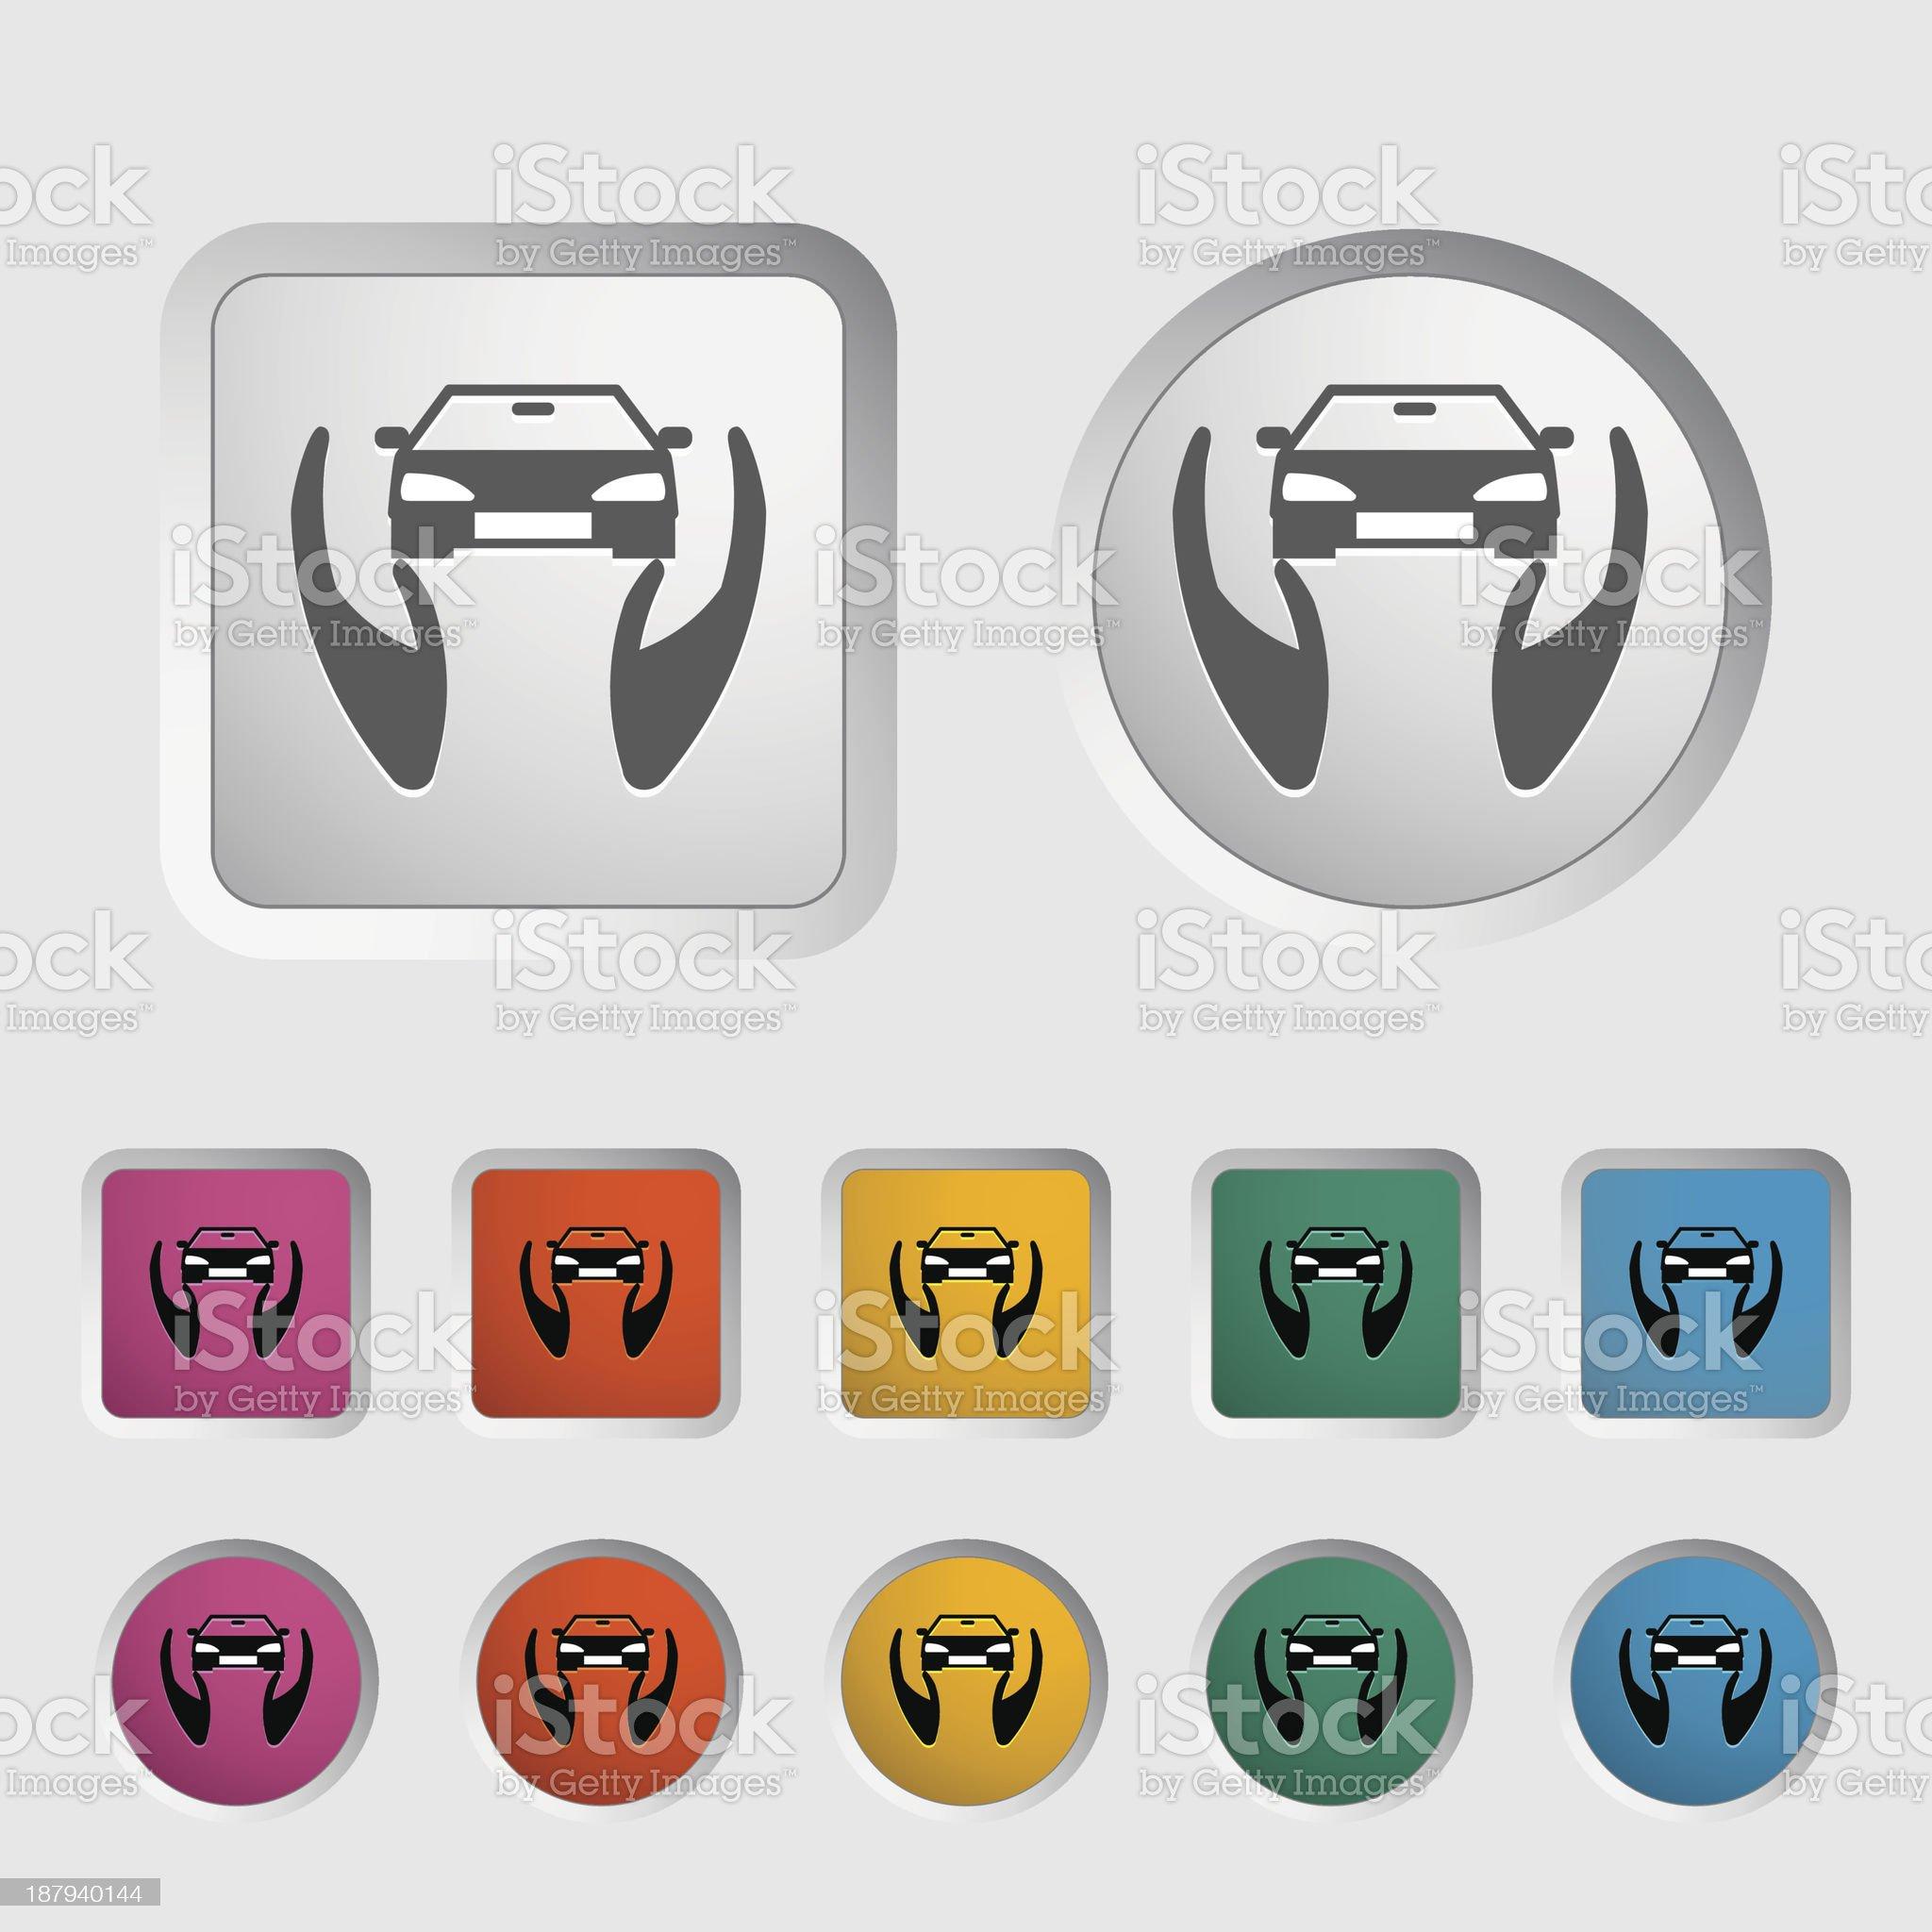 Concept car insurance. royalty-free stock vector art